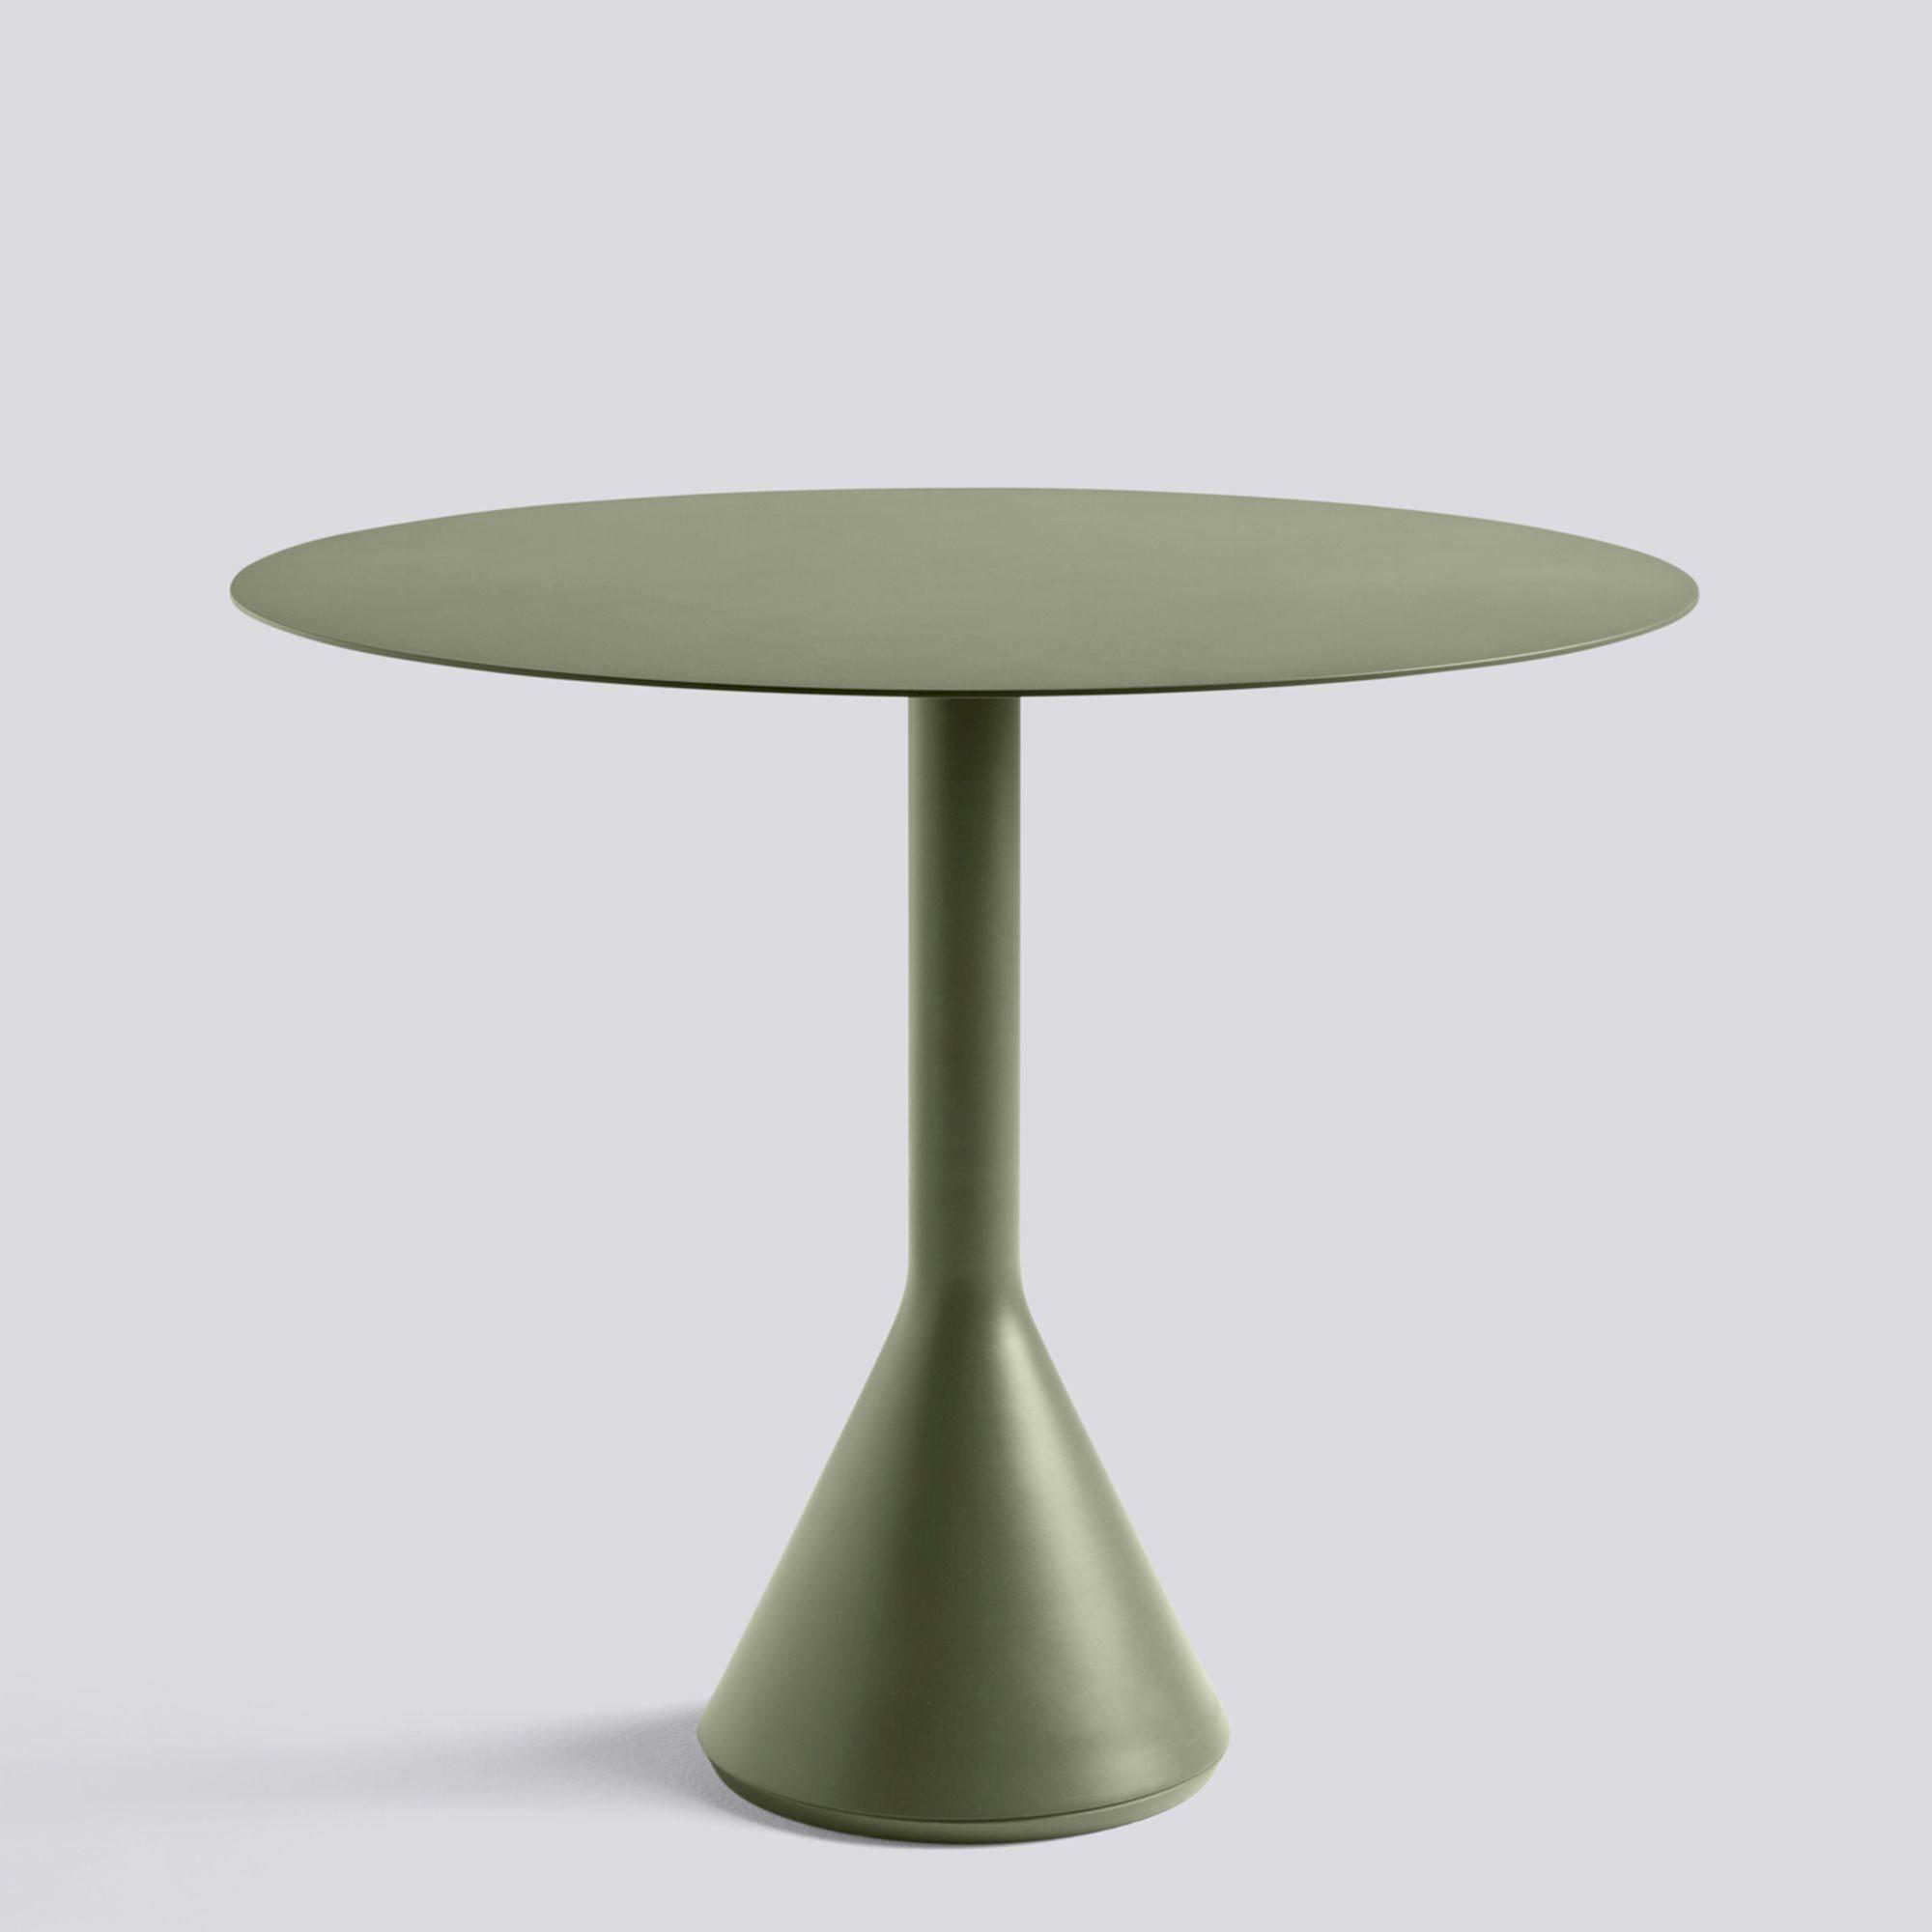 CONE TABLE by Ronan & Erwan Bouroullec